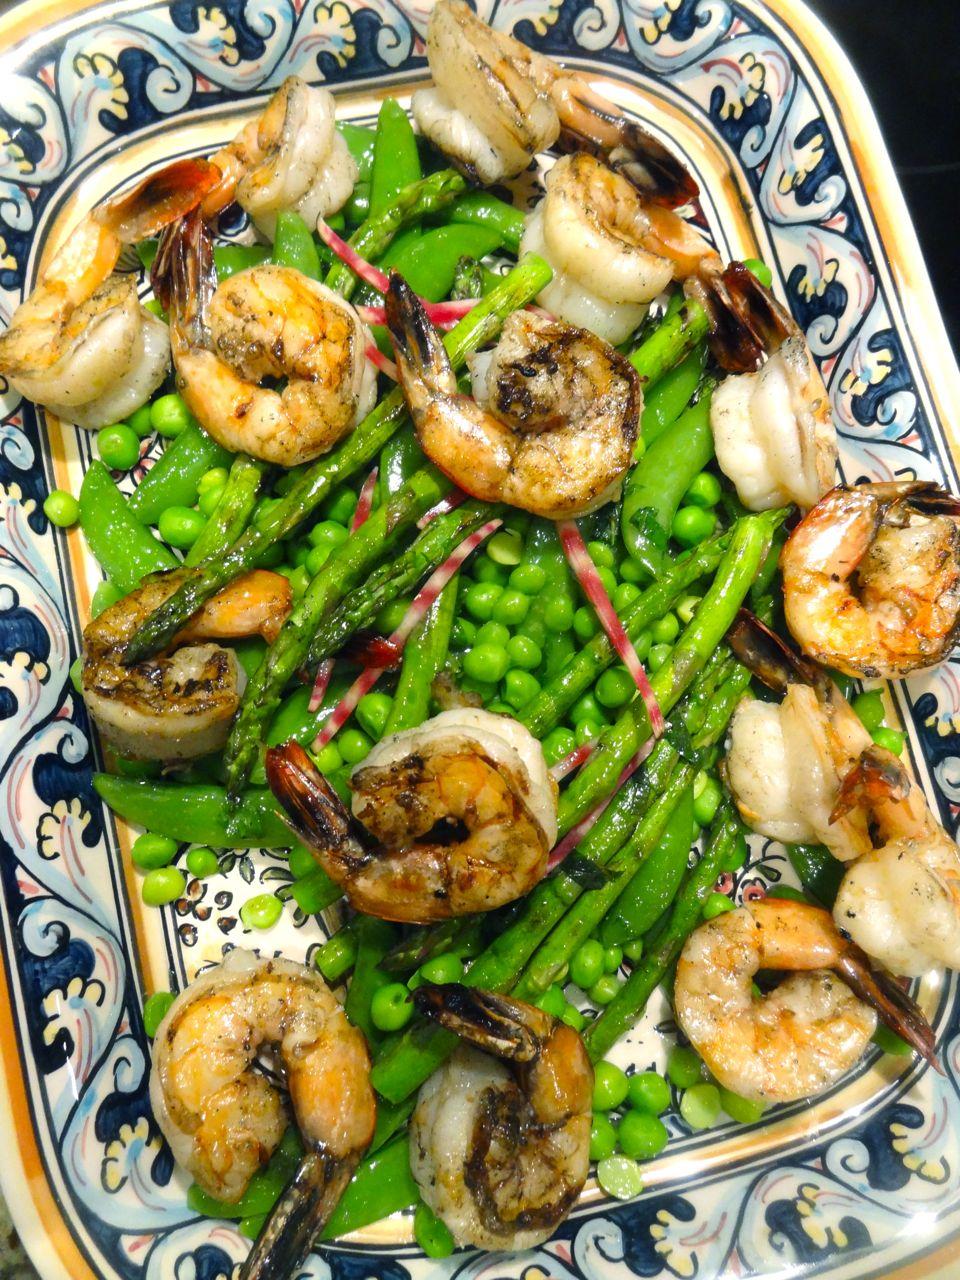 Scrumpdillyicious: Spring Pea & Asparagus Salad with Shrimp & Chioggia